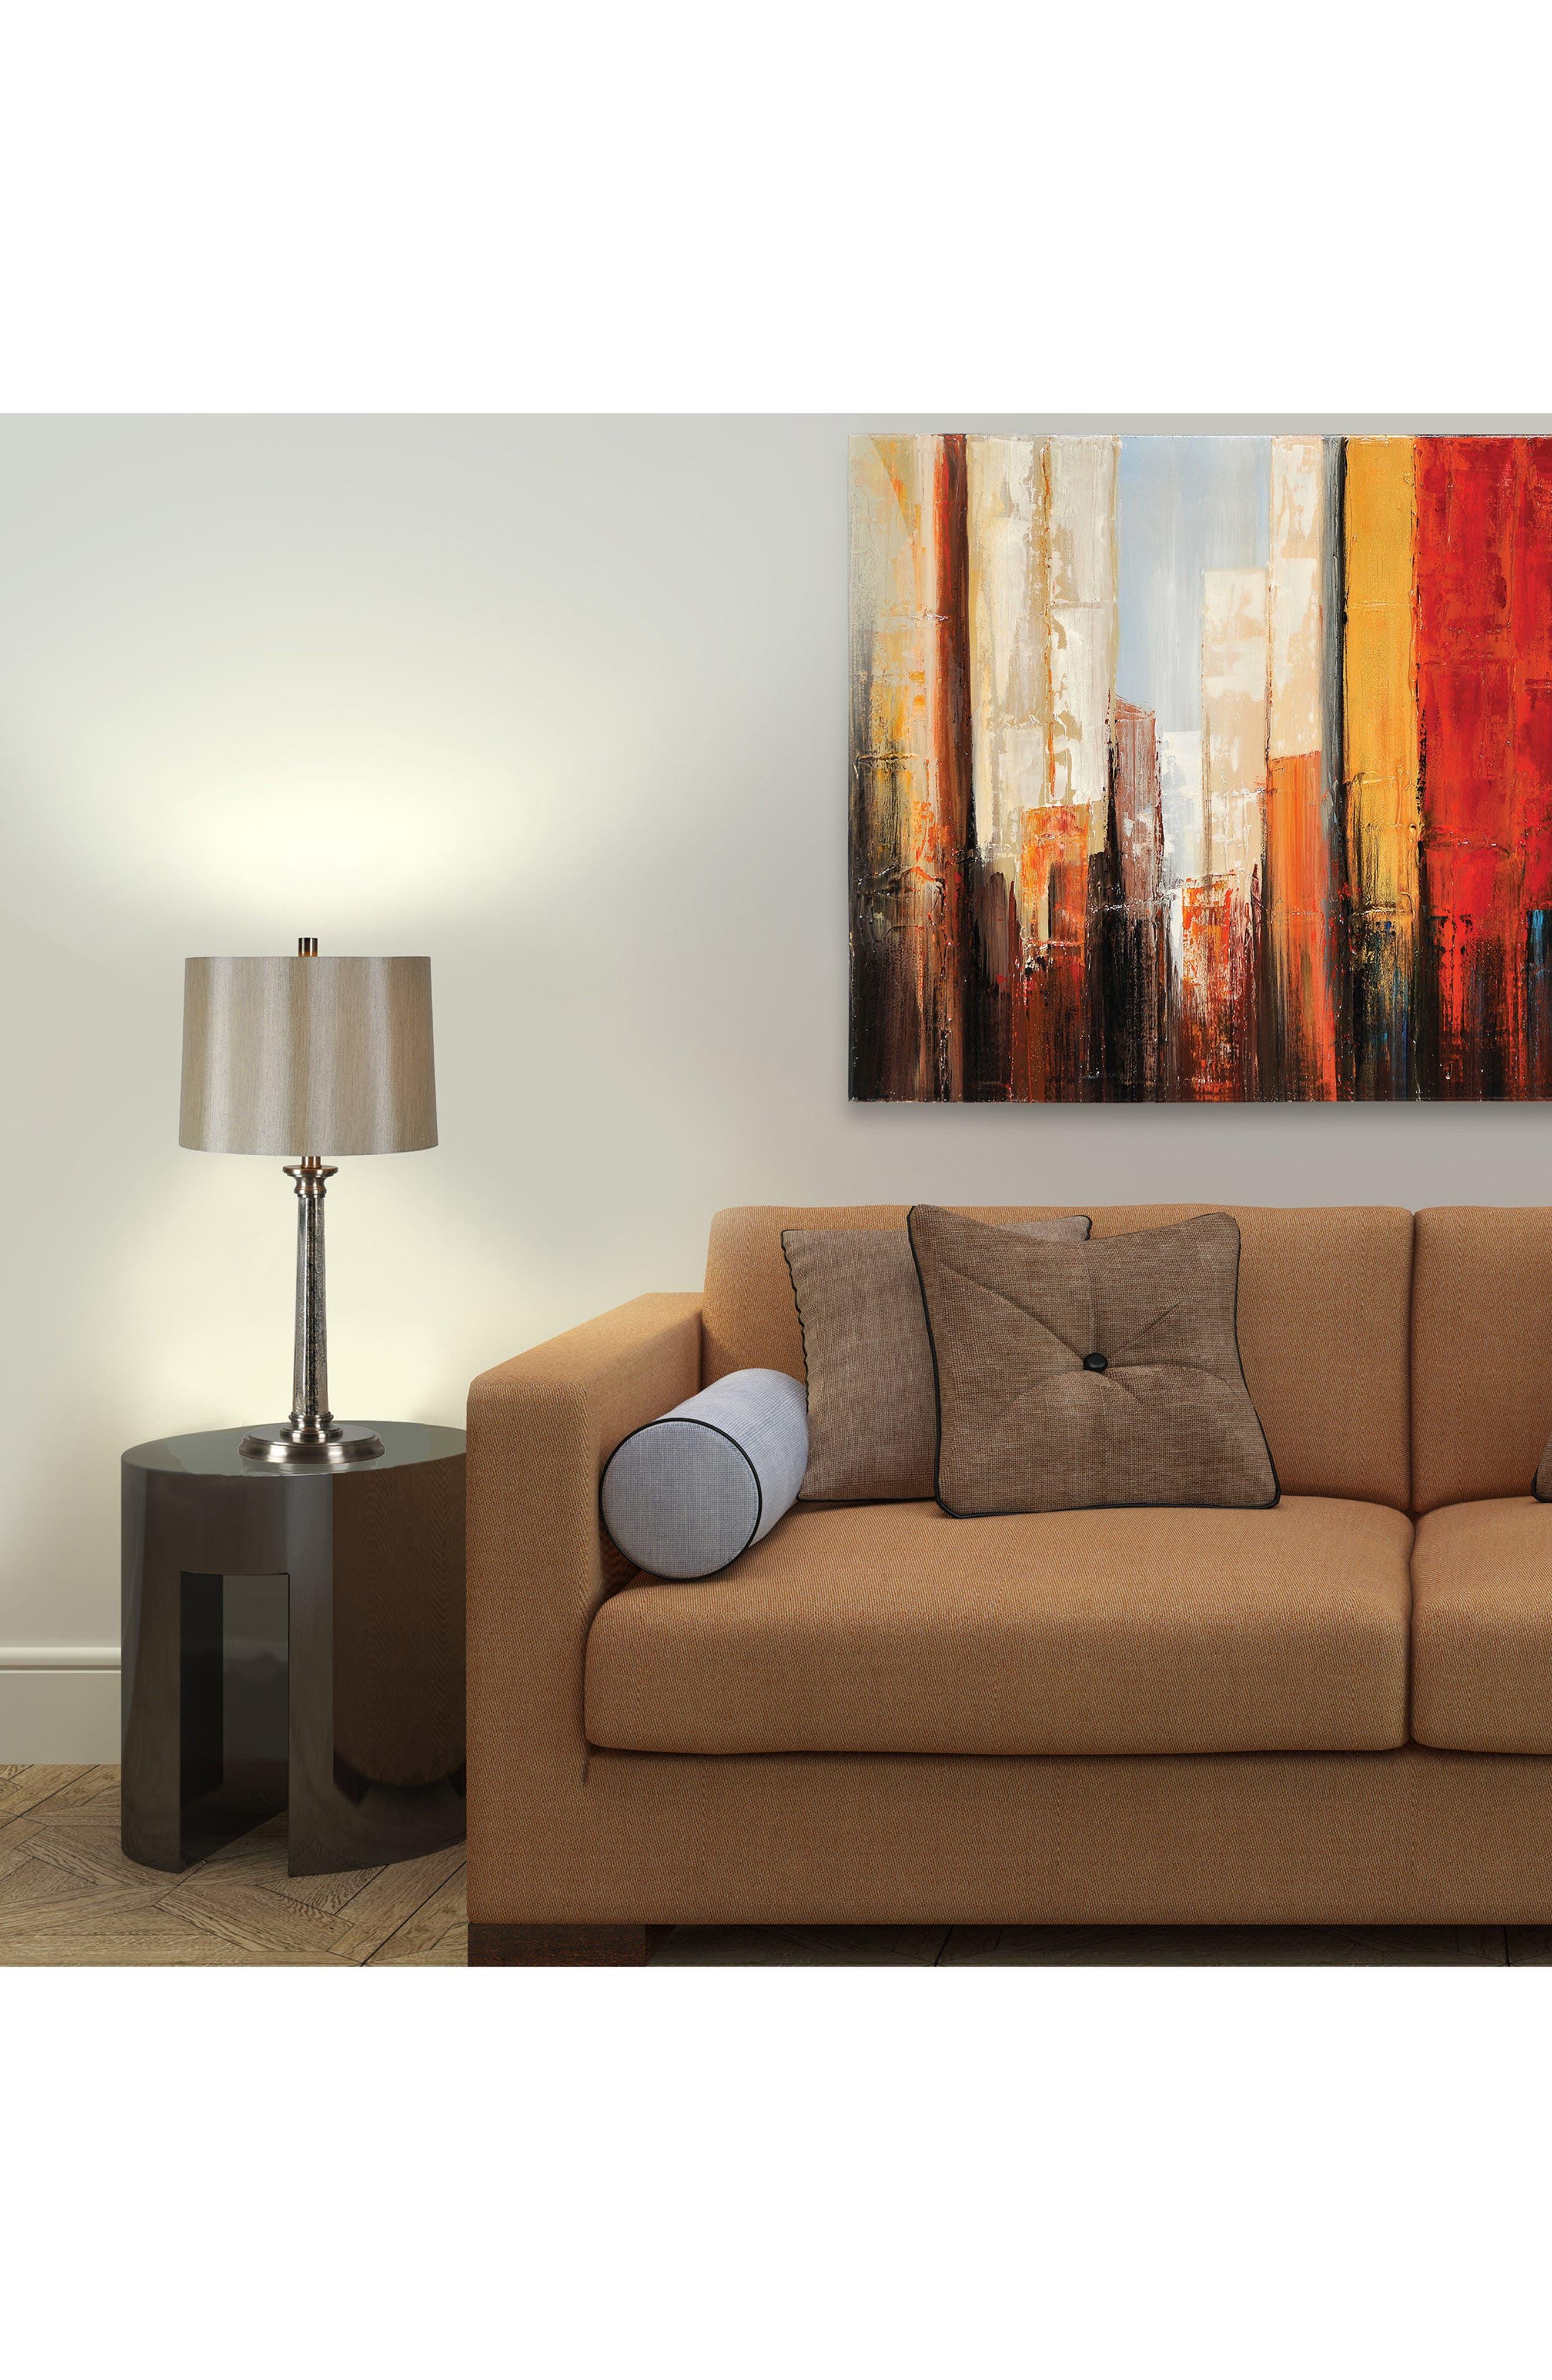 Brooks Set of 2 Table Lamps,                             Alternate thumbnail 2, color,                             SATIN NICKEL